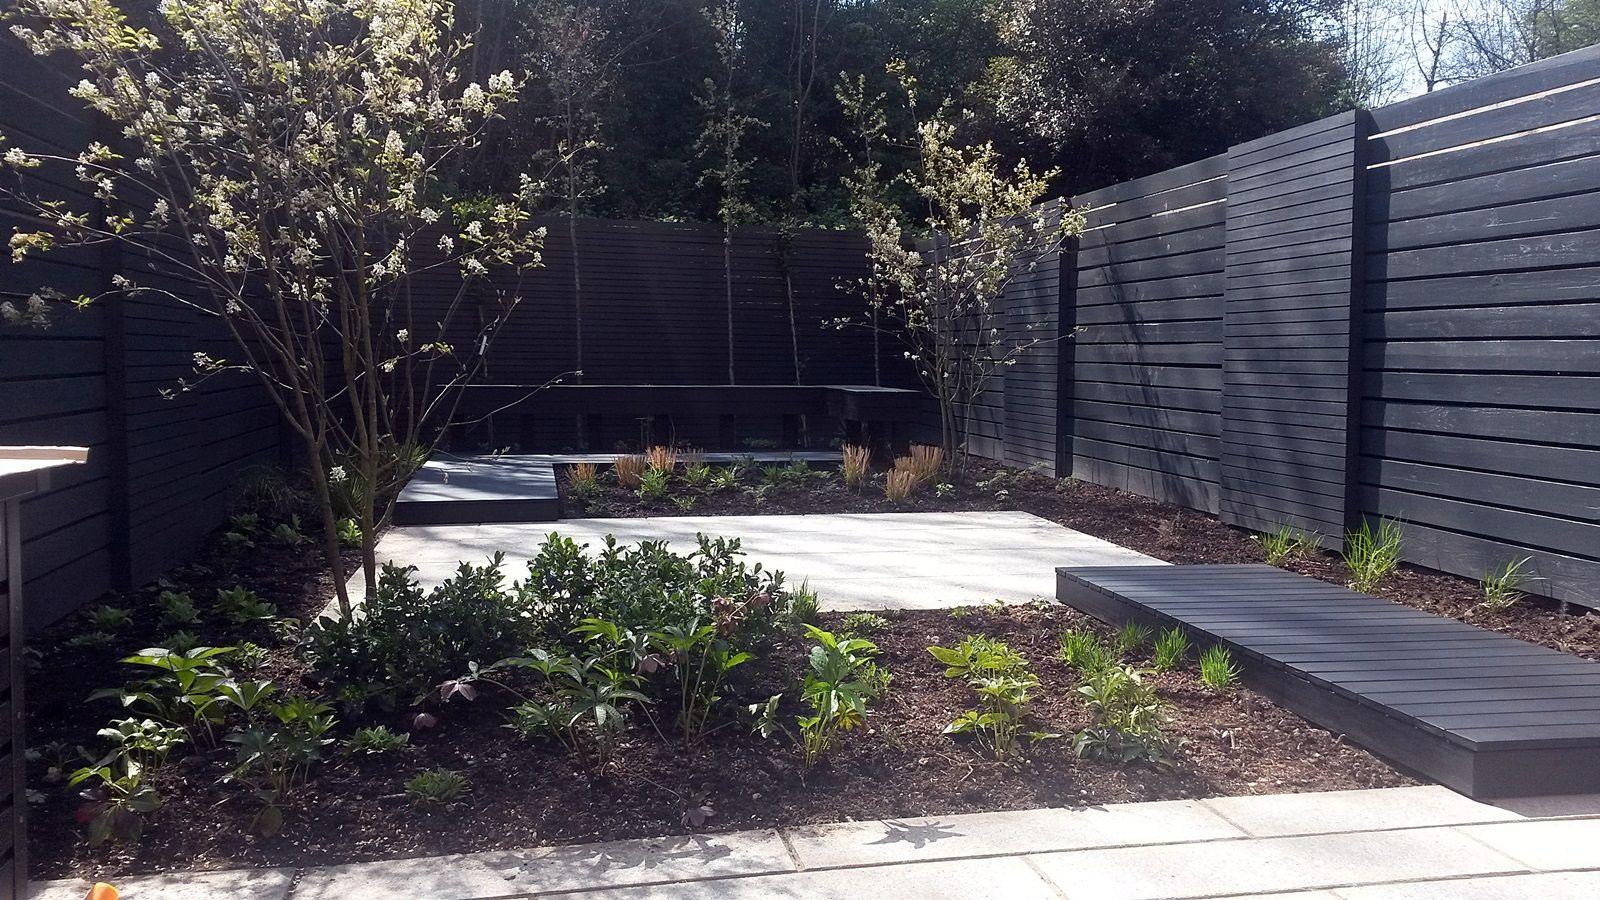 modern garden design london black and grey trend 2015 - Garden Design Trends 2015